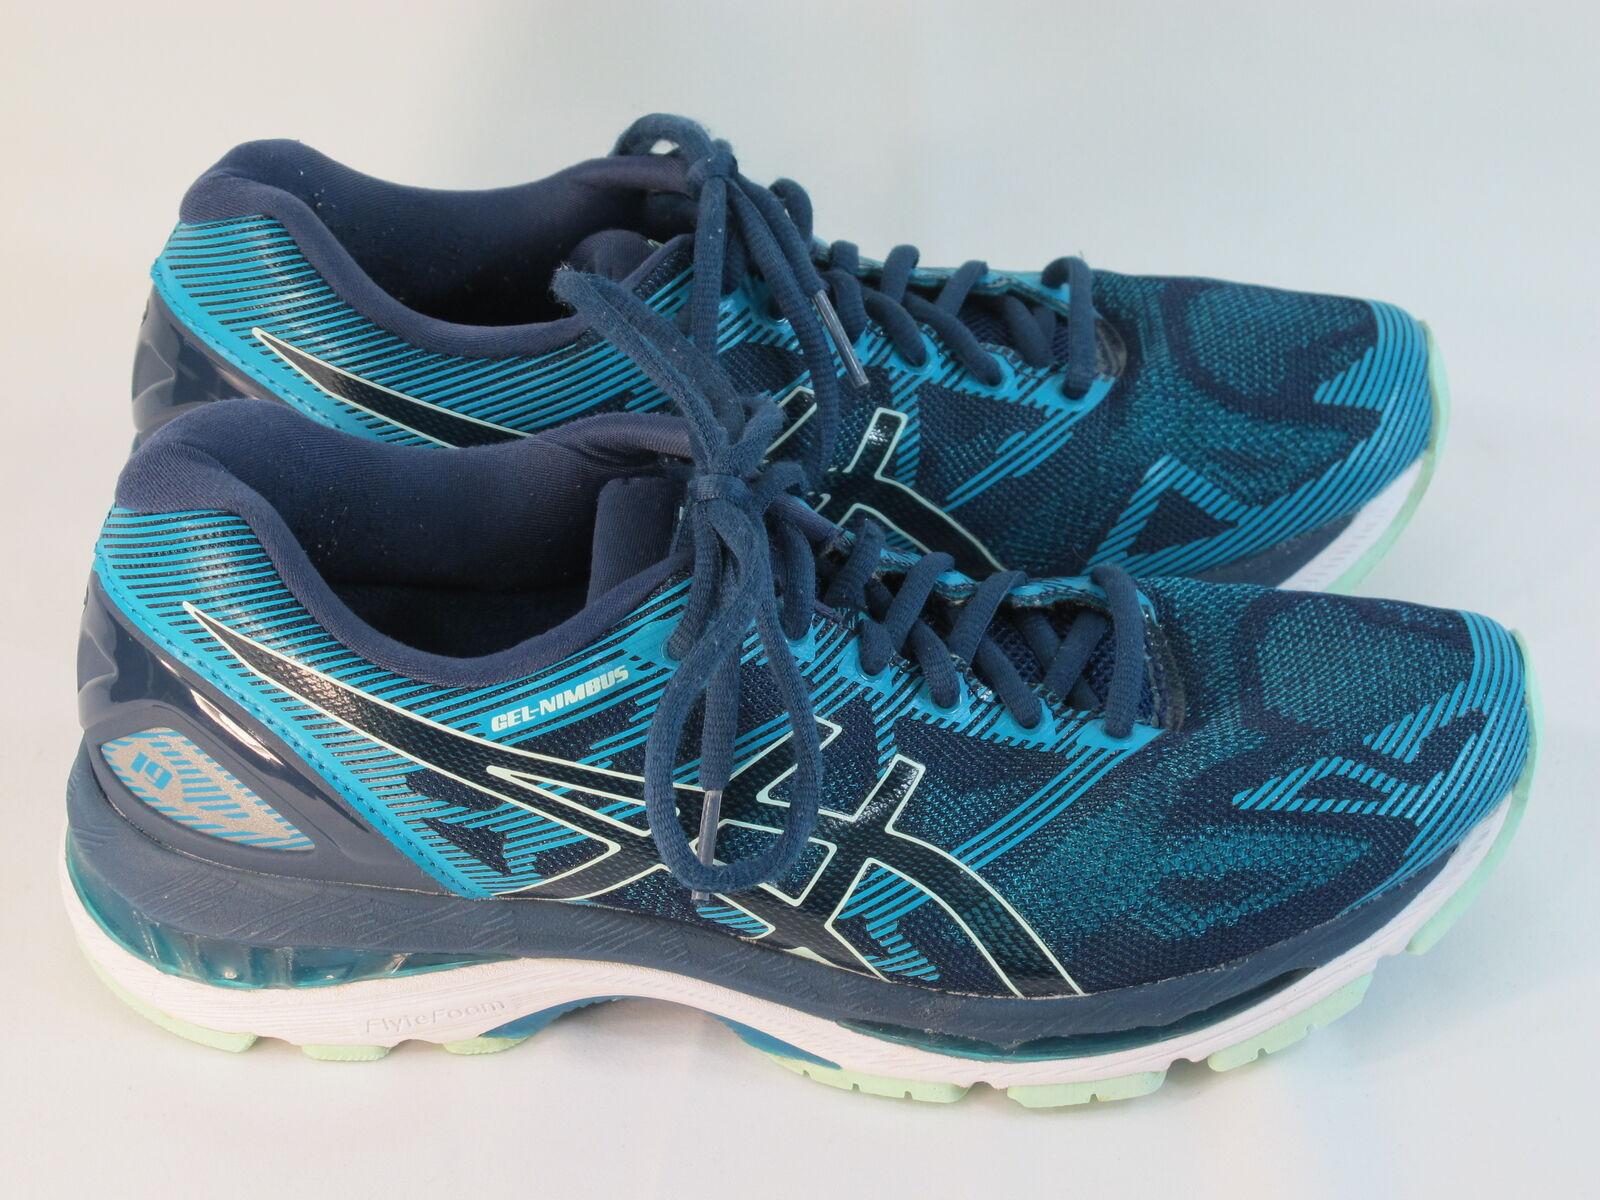 ASICS Gel Nimbus 19 Running Shoes Women's Comfortable best-selling model of the brand